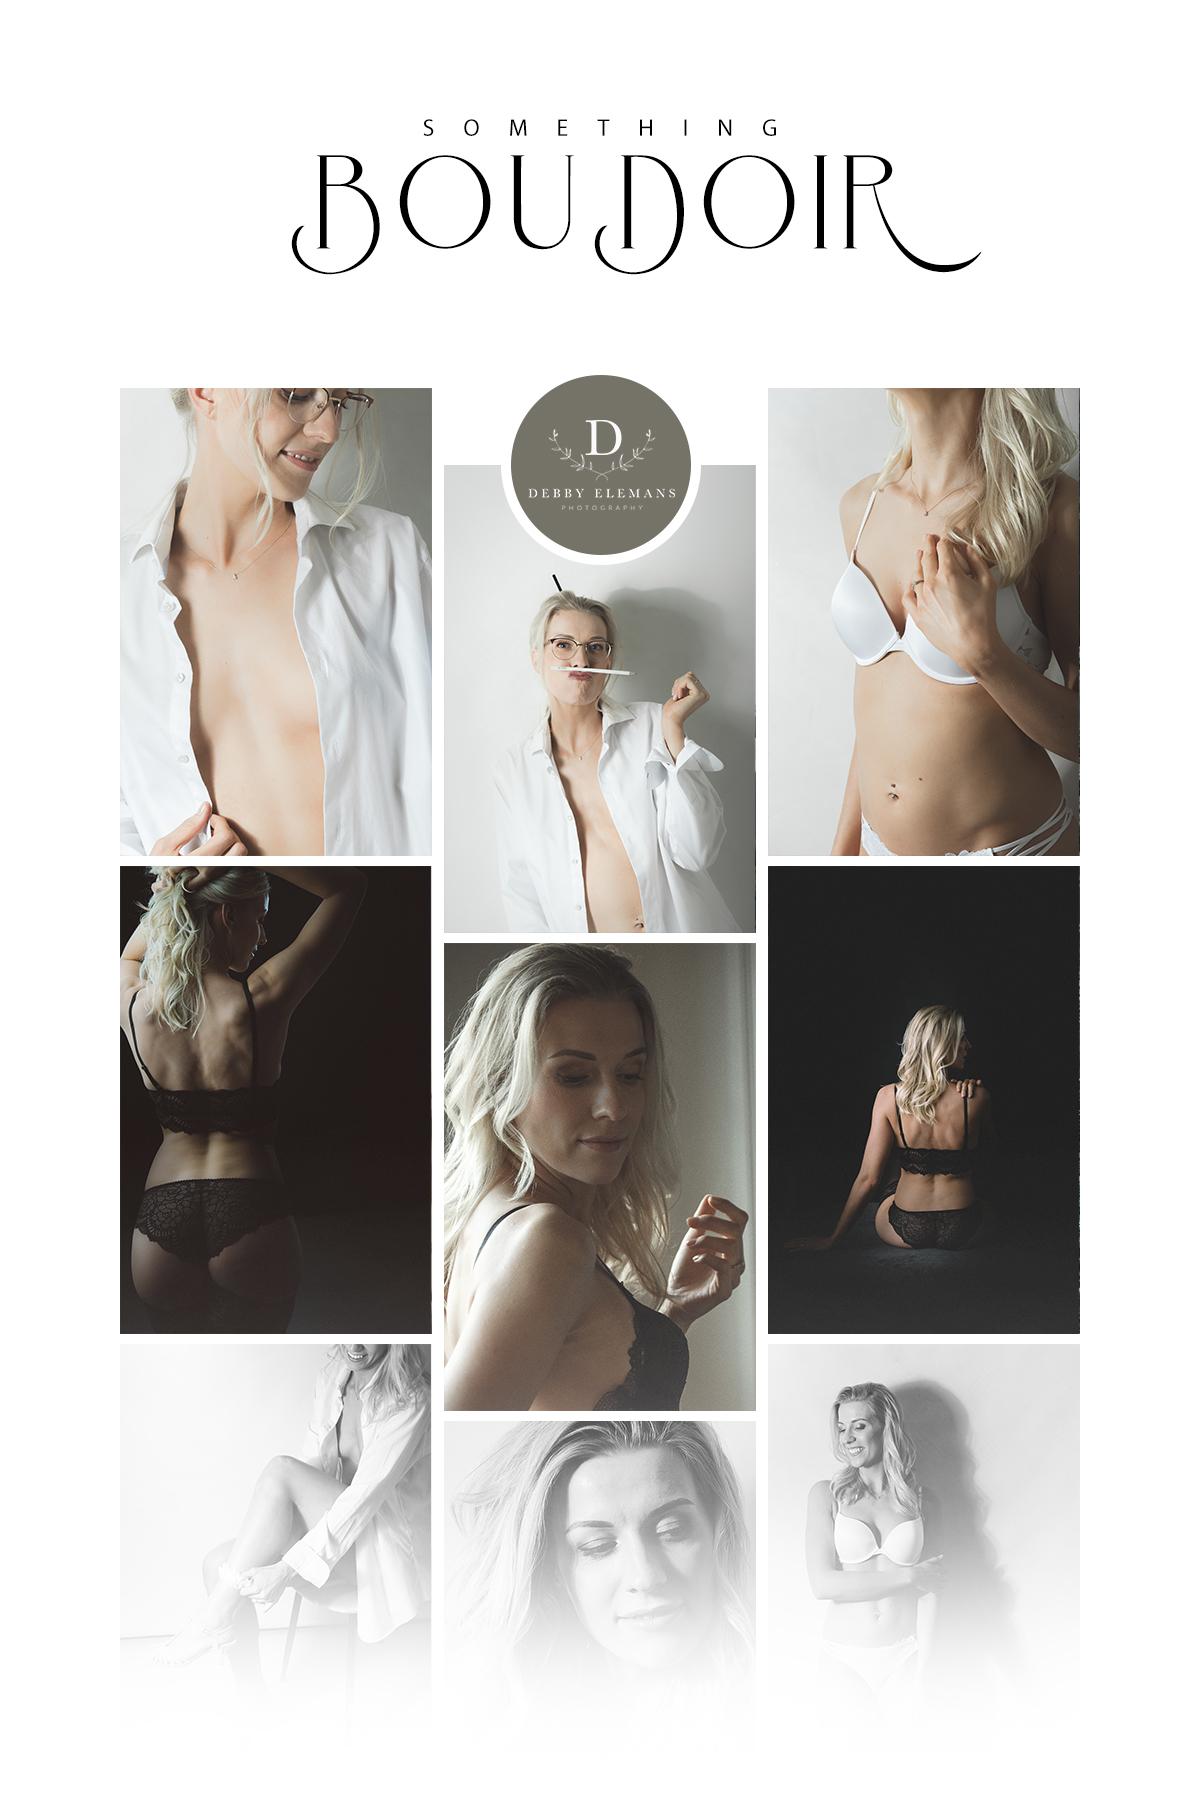 boudoirfotograaf